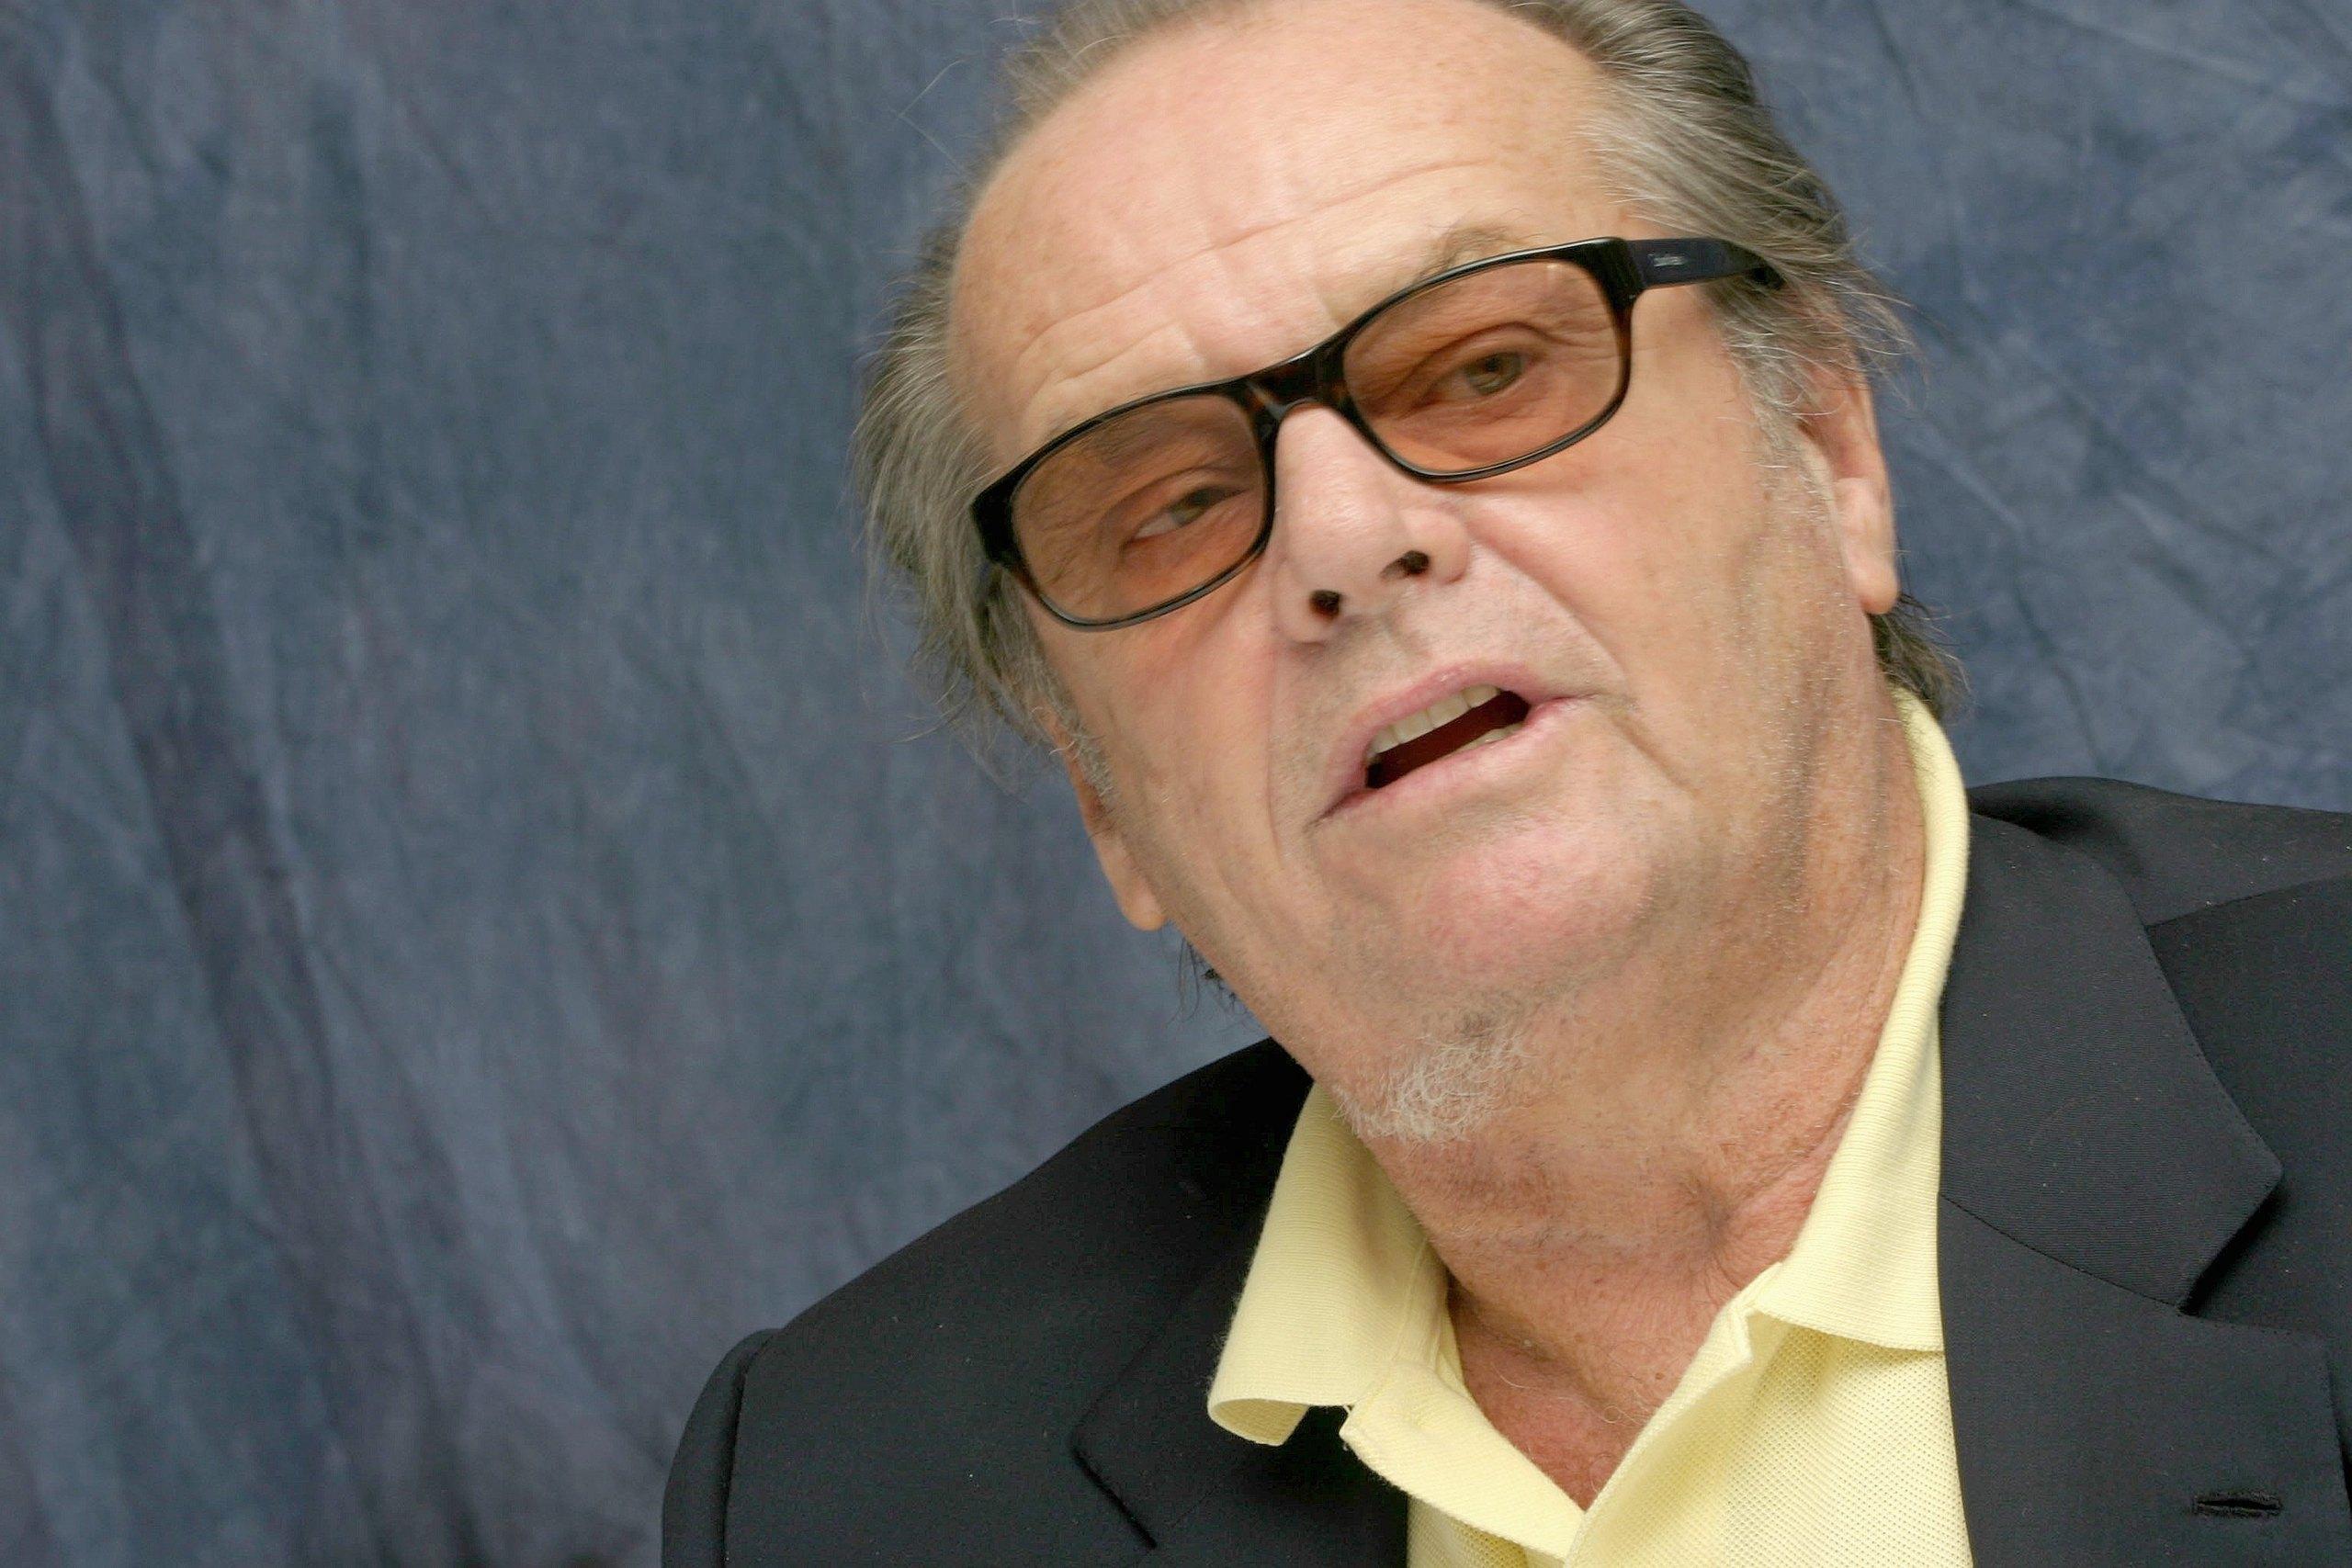 Jack Nicholson Computer Wallpaper